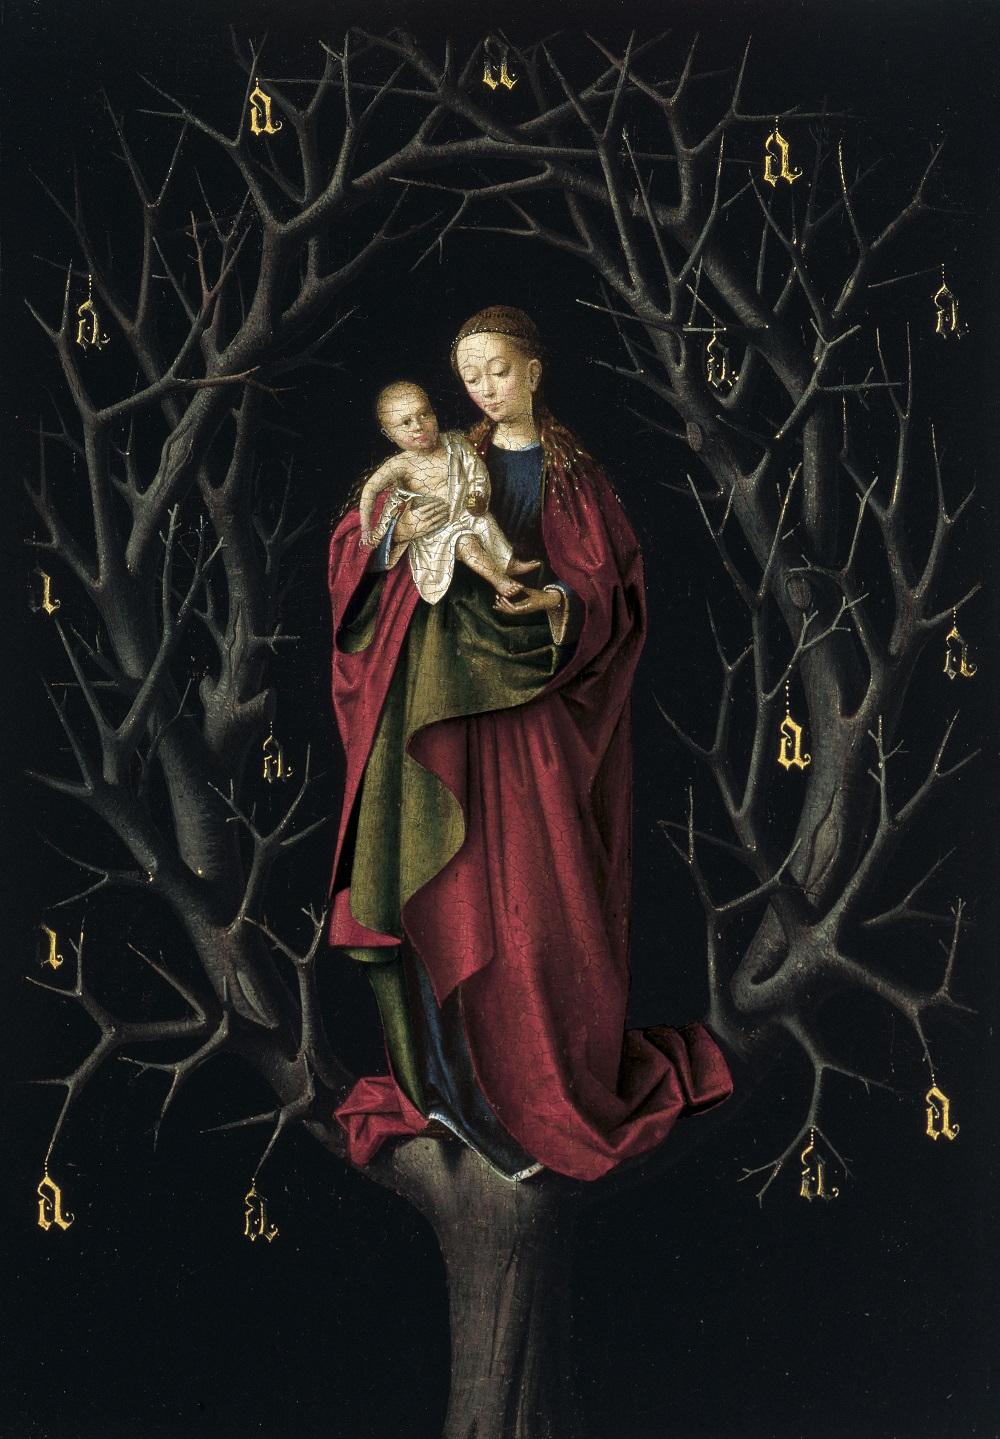 Christus, Petrus - Богоматерь сухого древа, ок. 1465